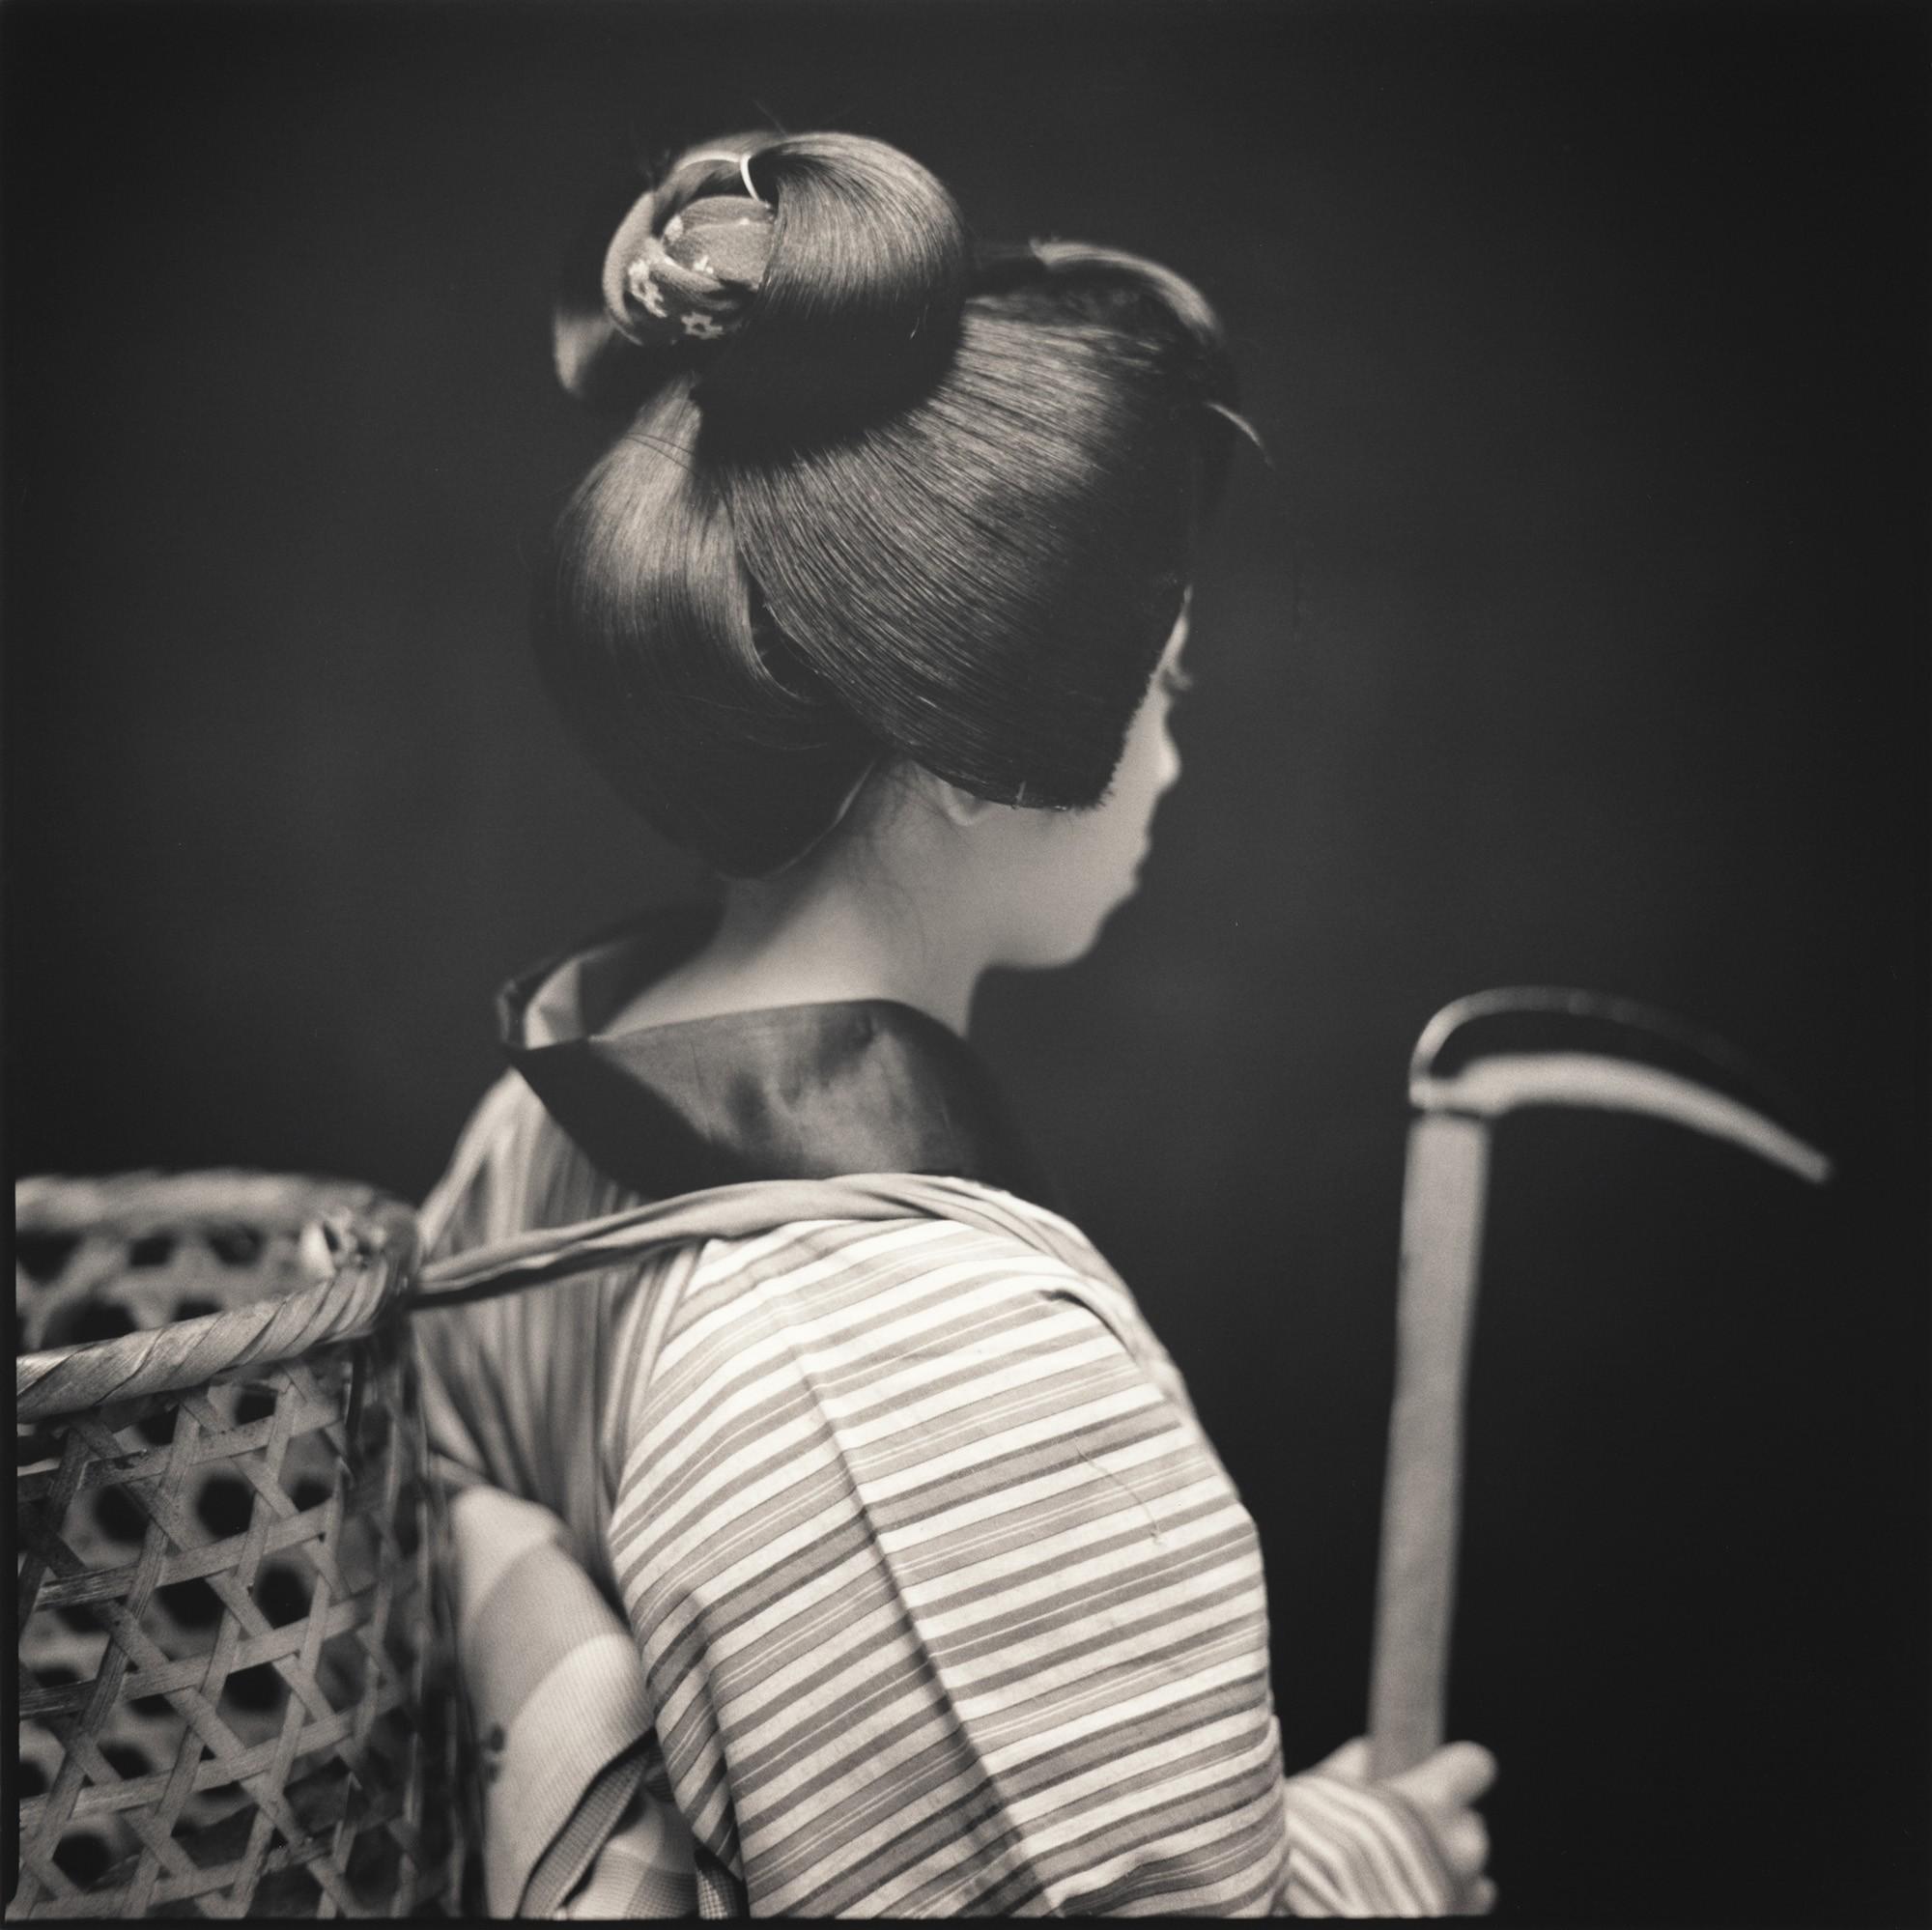 Актёры кабуки. Нори Маруяма в роли Окоу. Хироси Ватанабэ